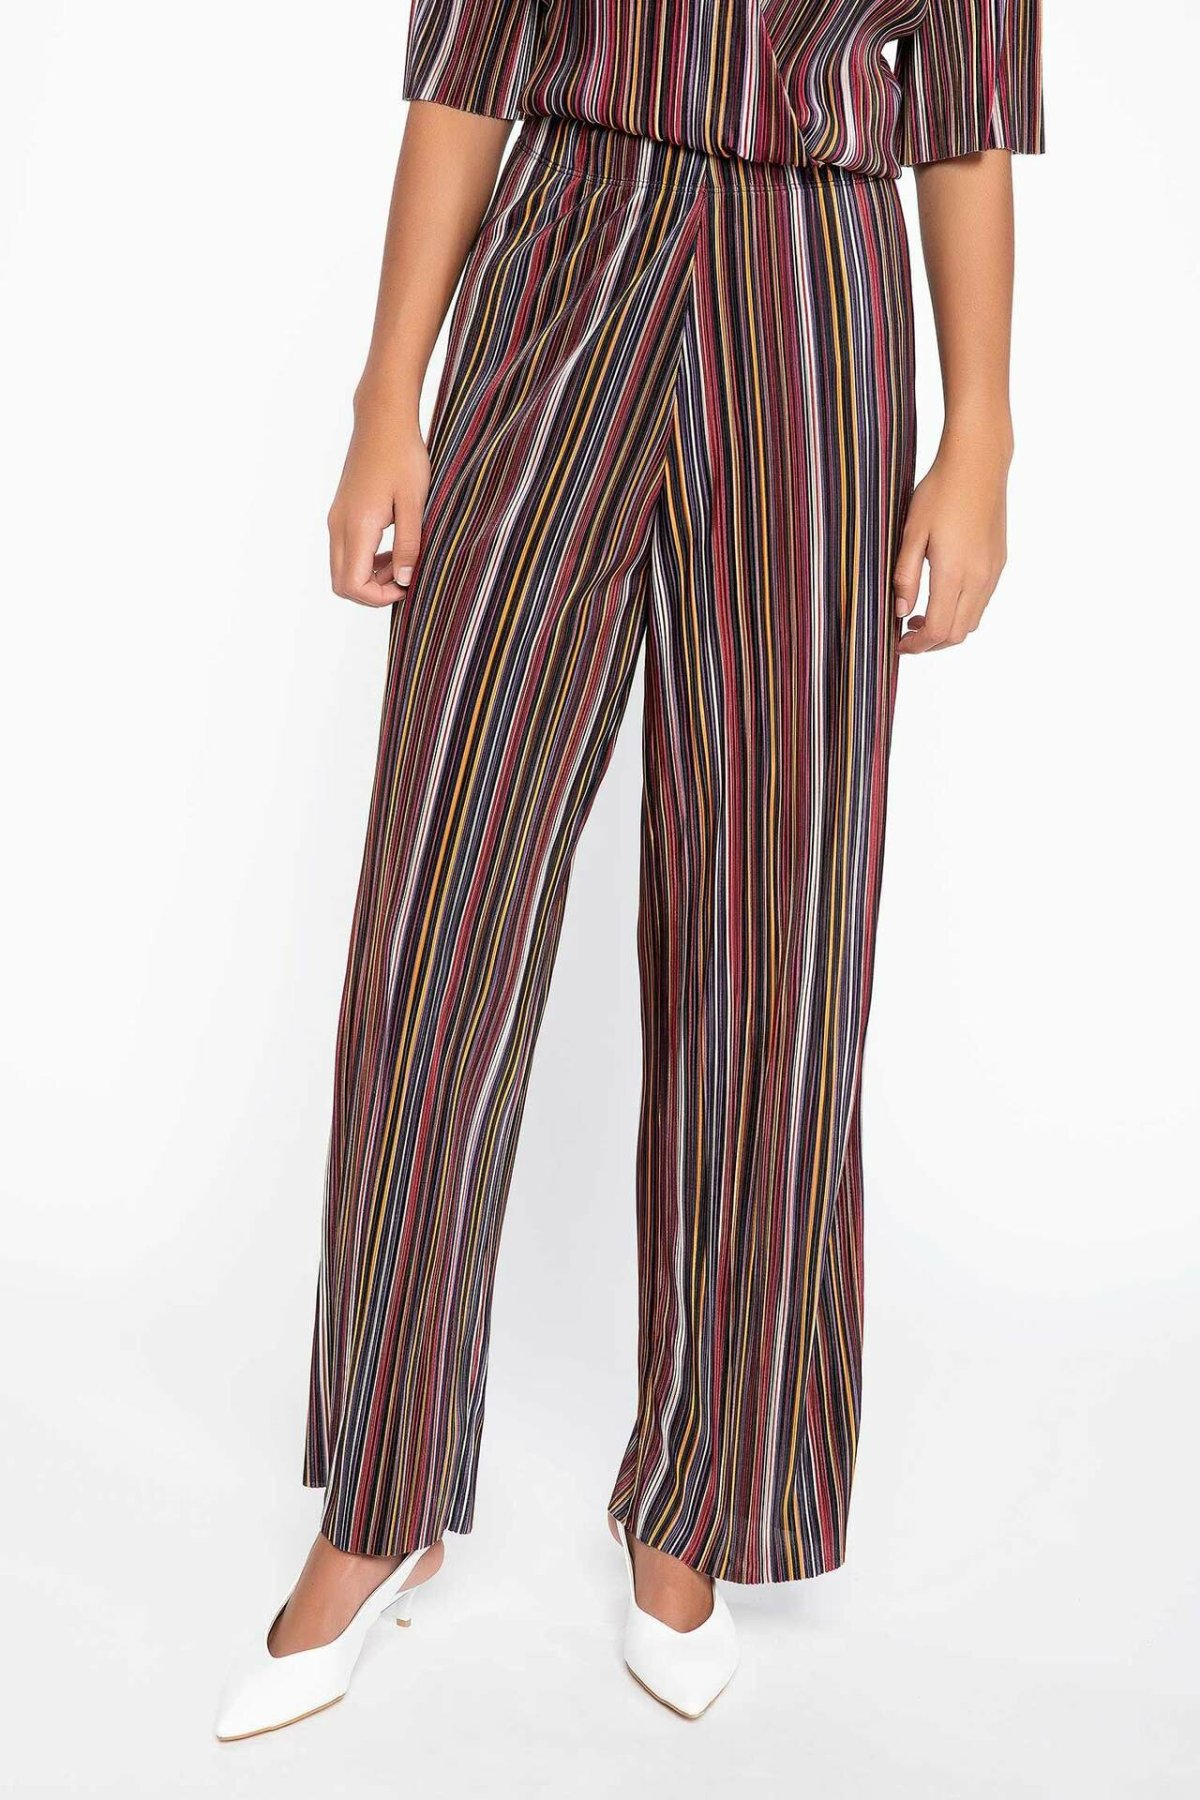 DeFacto Women Fashion Trousers Female Casual Comfort Pants High Qualilty Striped Loose Long Wide Leg Pant Female J7988AZ18AU